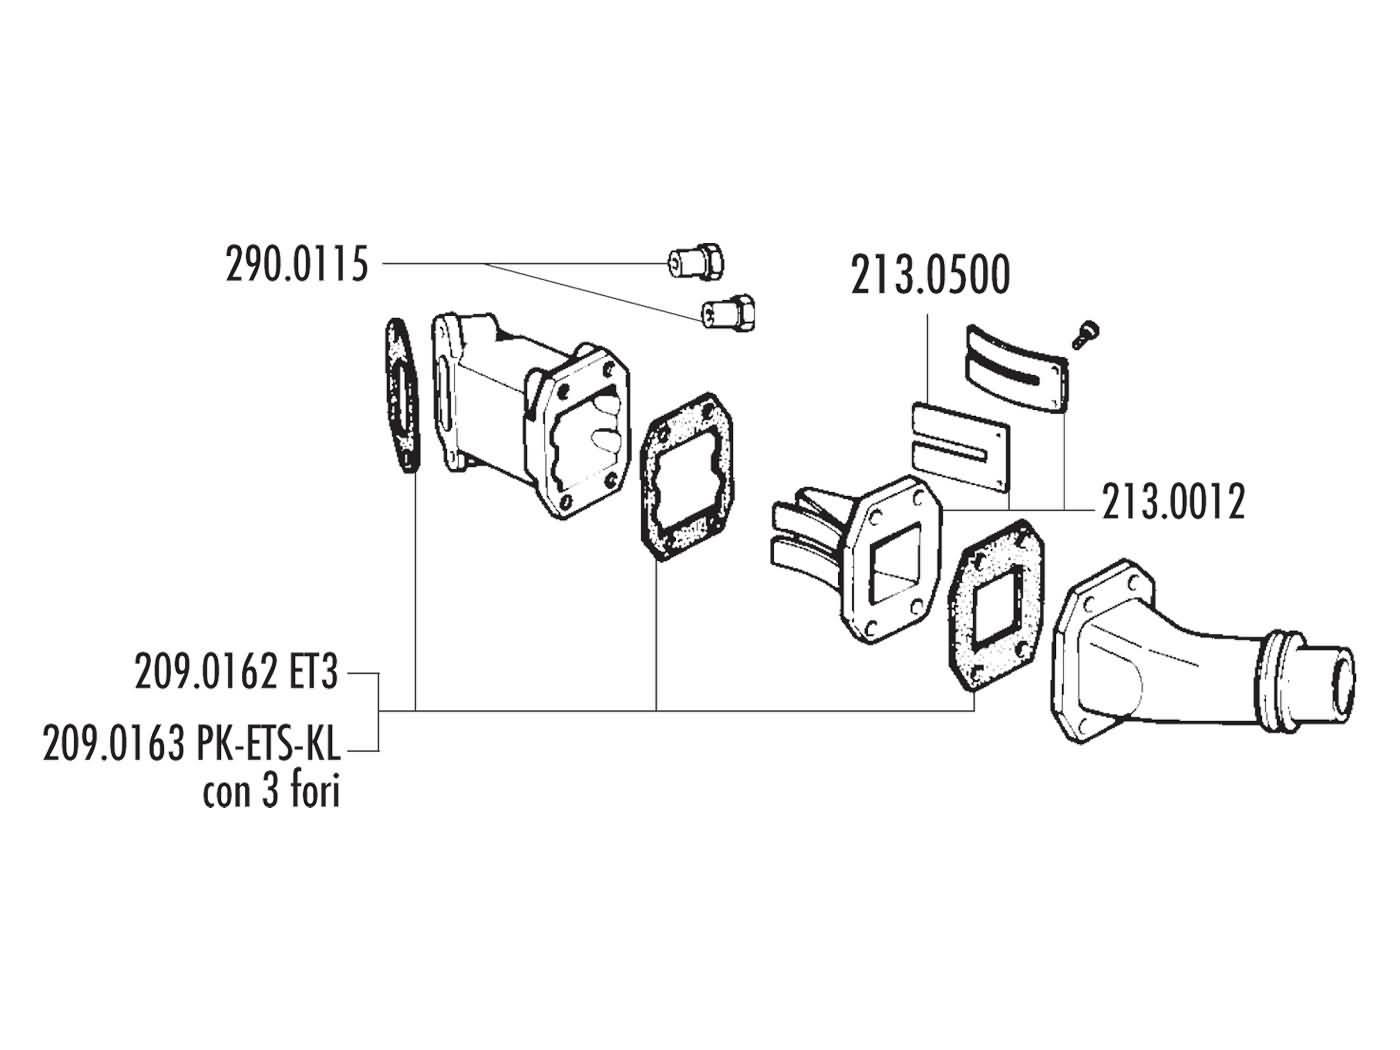 Intake Manifold Polini Reed Block 24 285mm For Vespa 50 Special Elite Popcorn Machine Wiring Diagrams 125 Primavera Et3